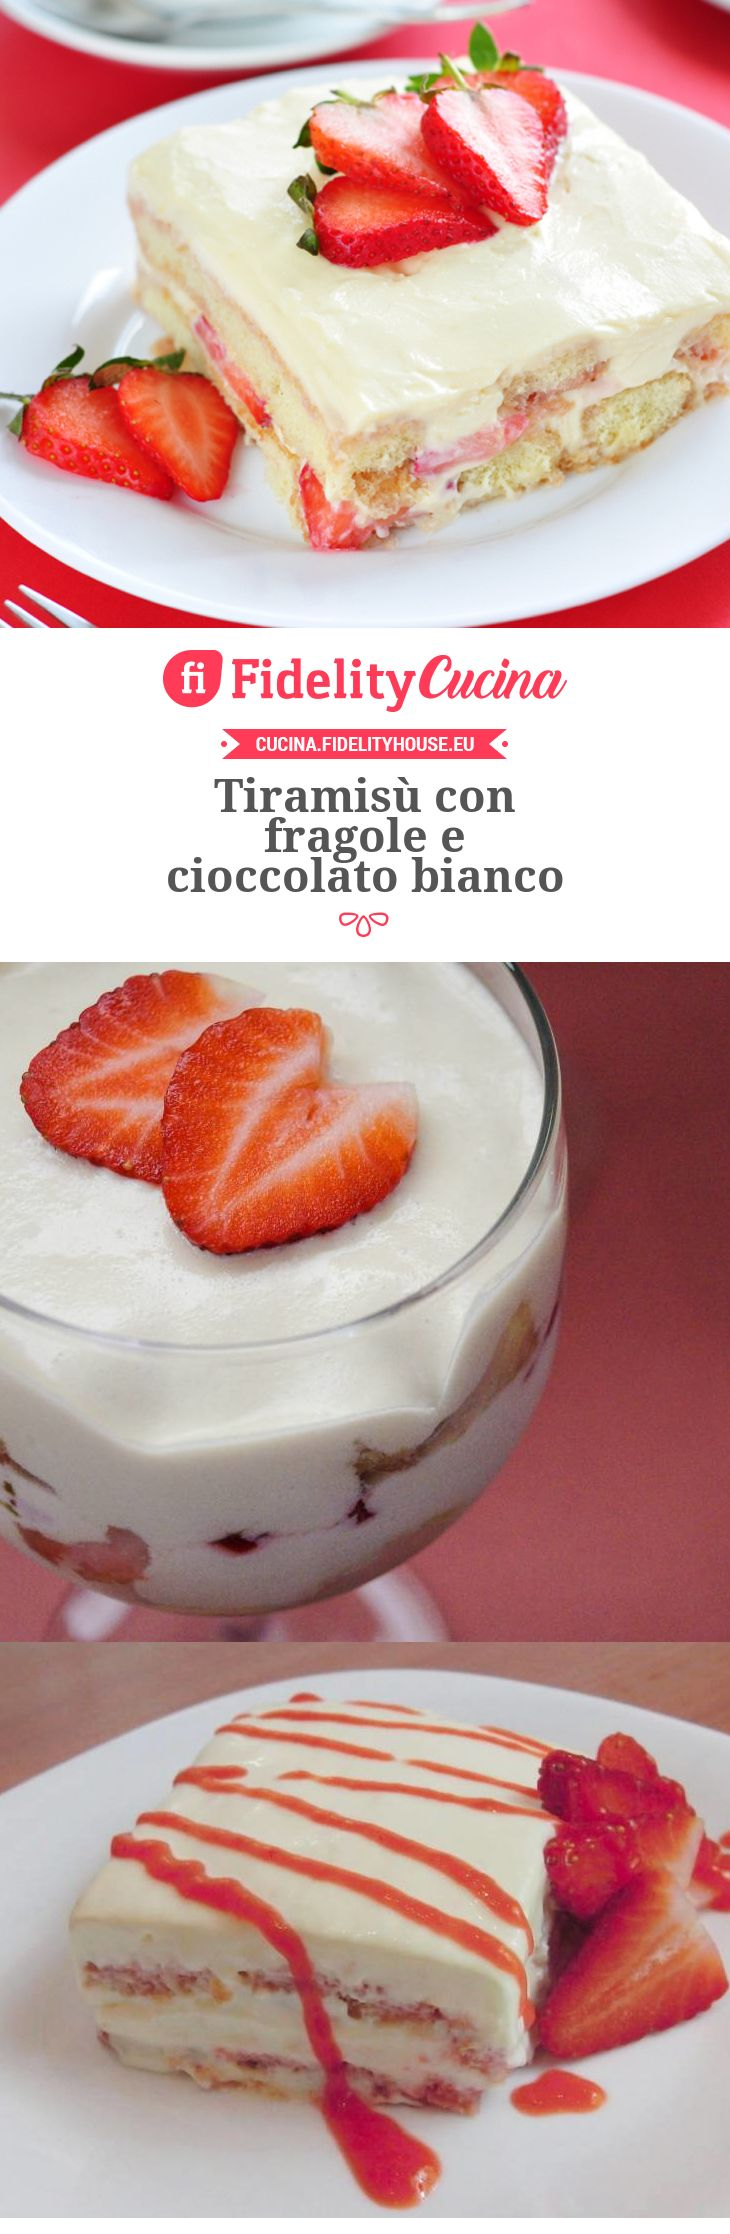 Tiramisù con fragole e cioccolato bianco